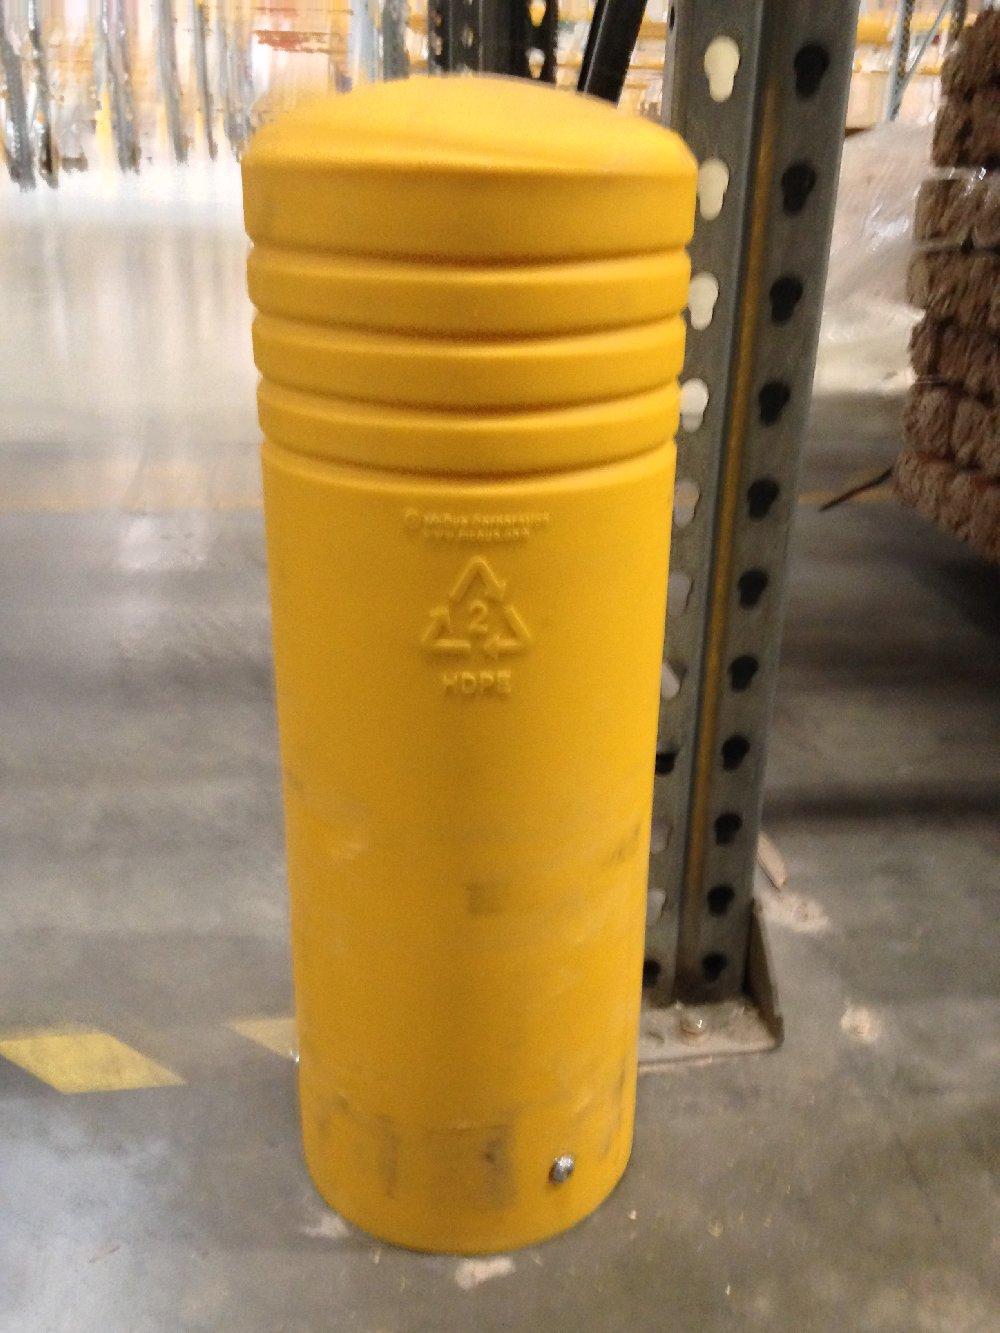 Poteau rotatif 500 mm